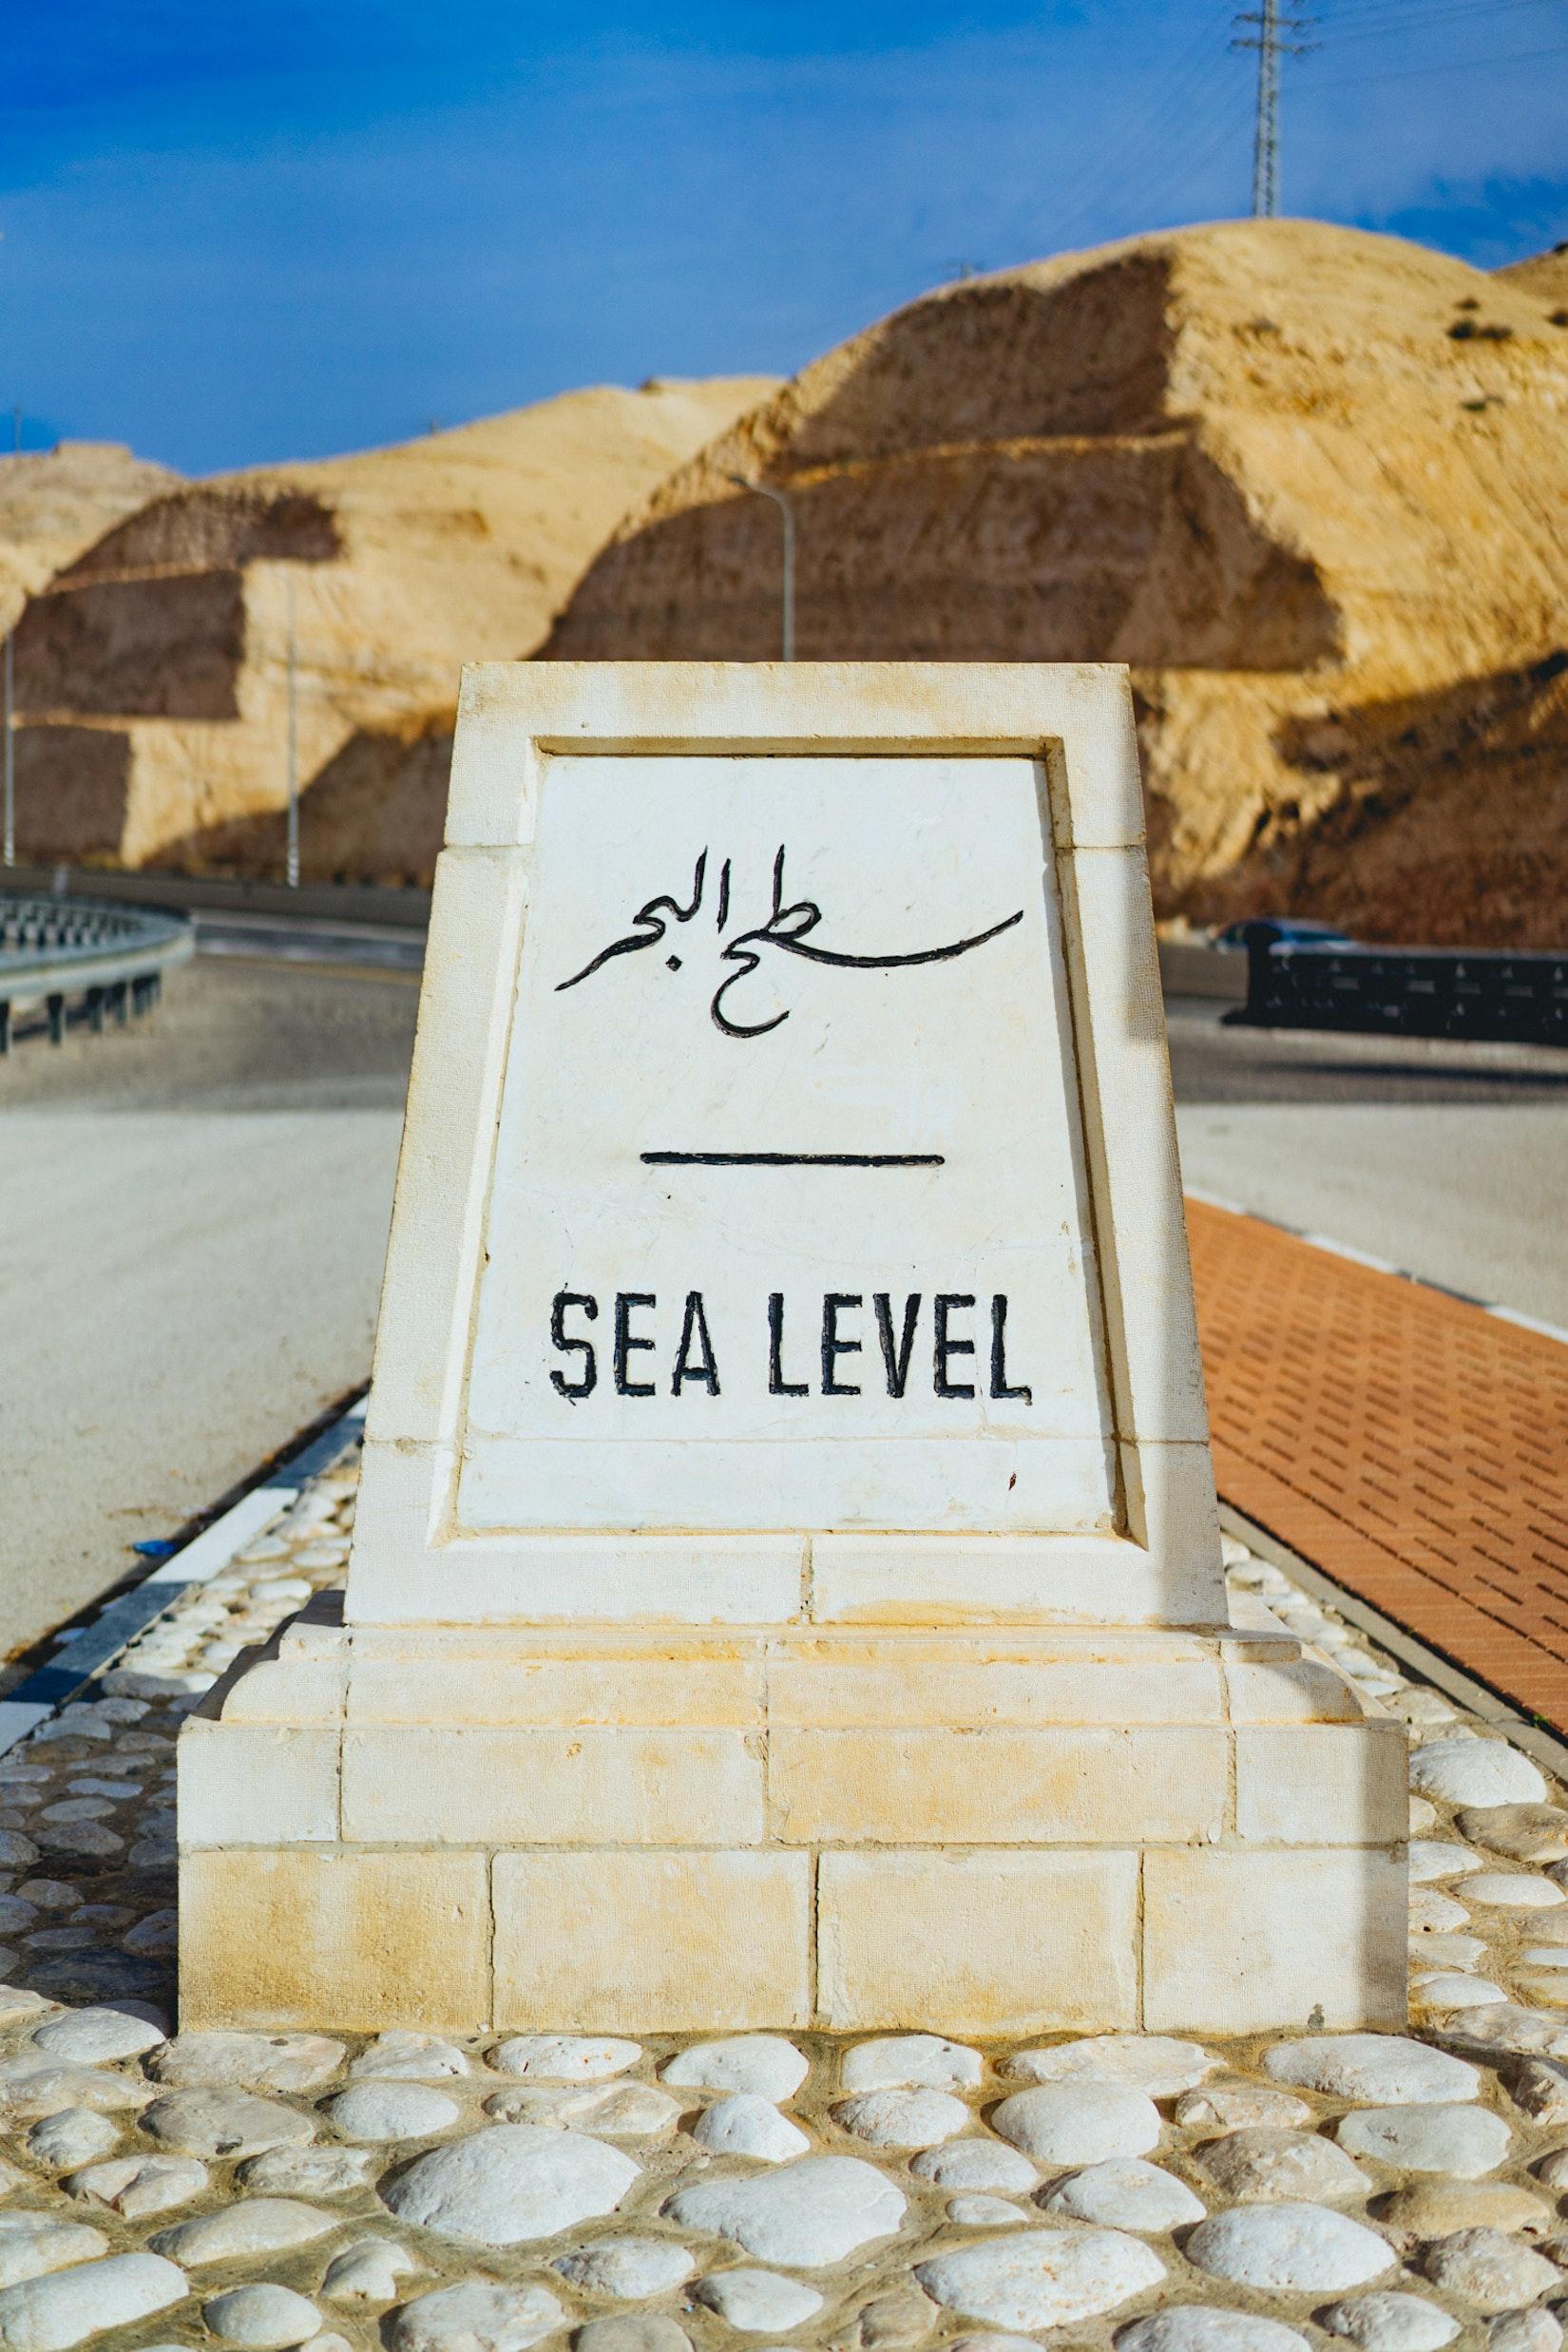 The sea level monument